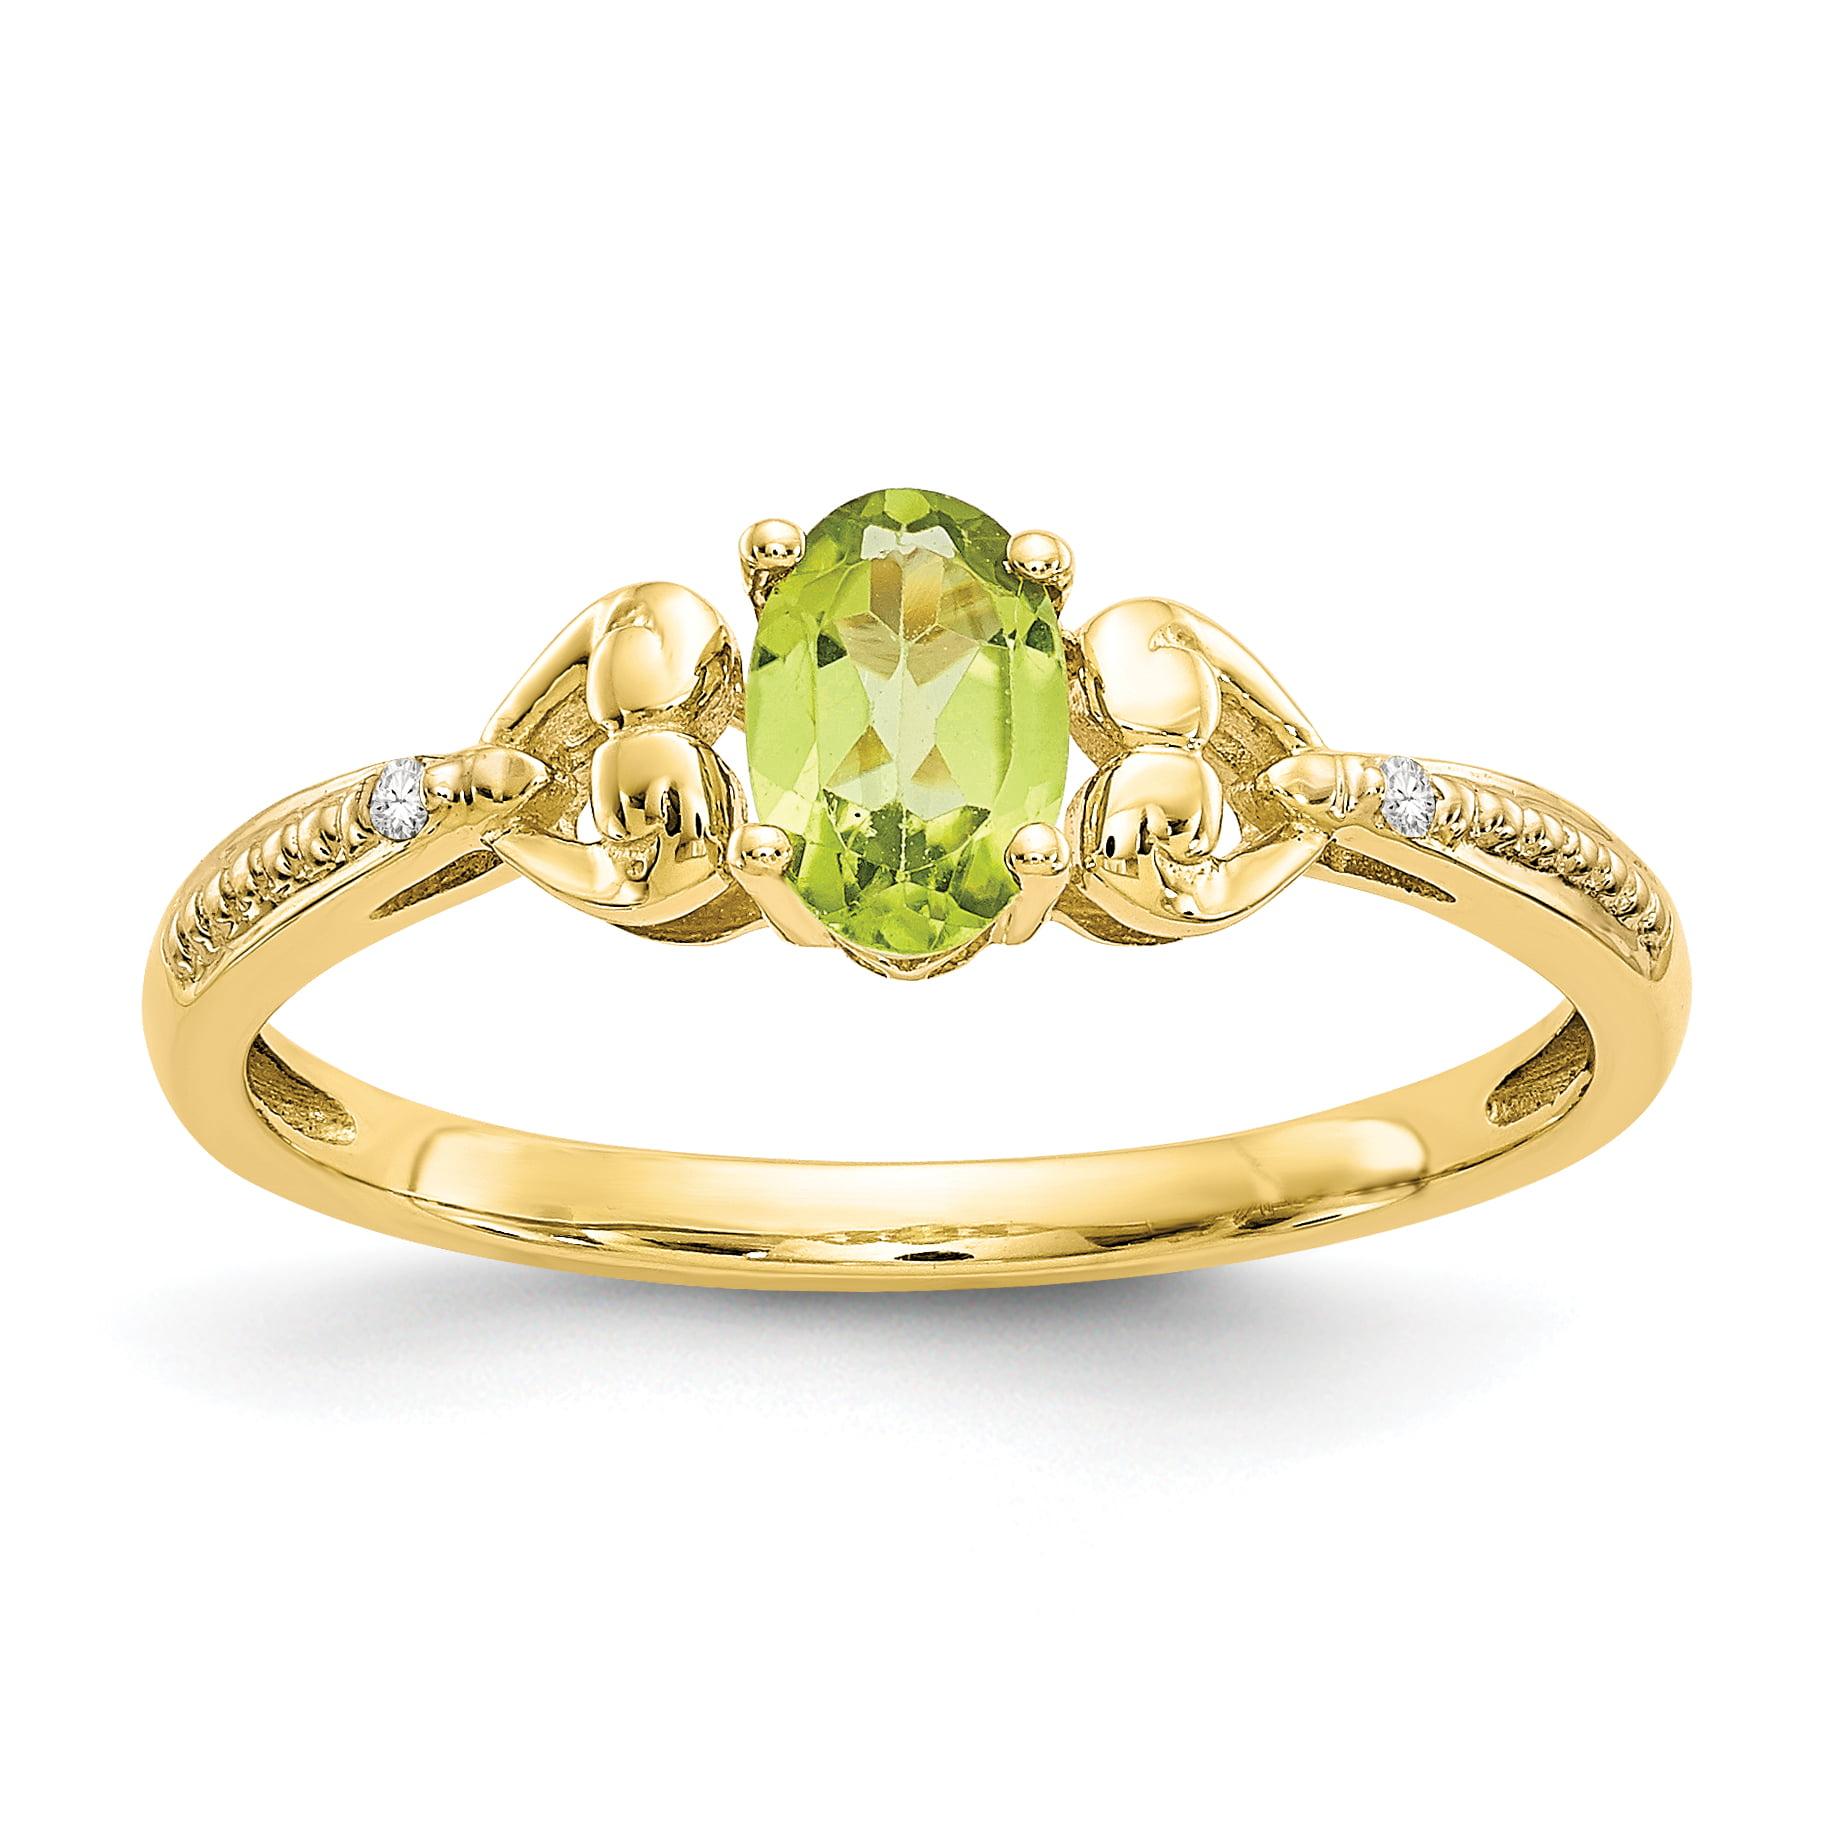 10K Peridot Diamond Ring by Saris and Things QG